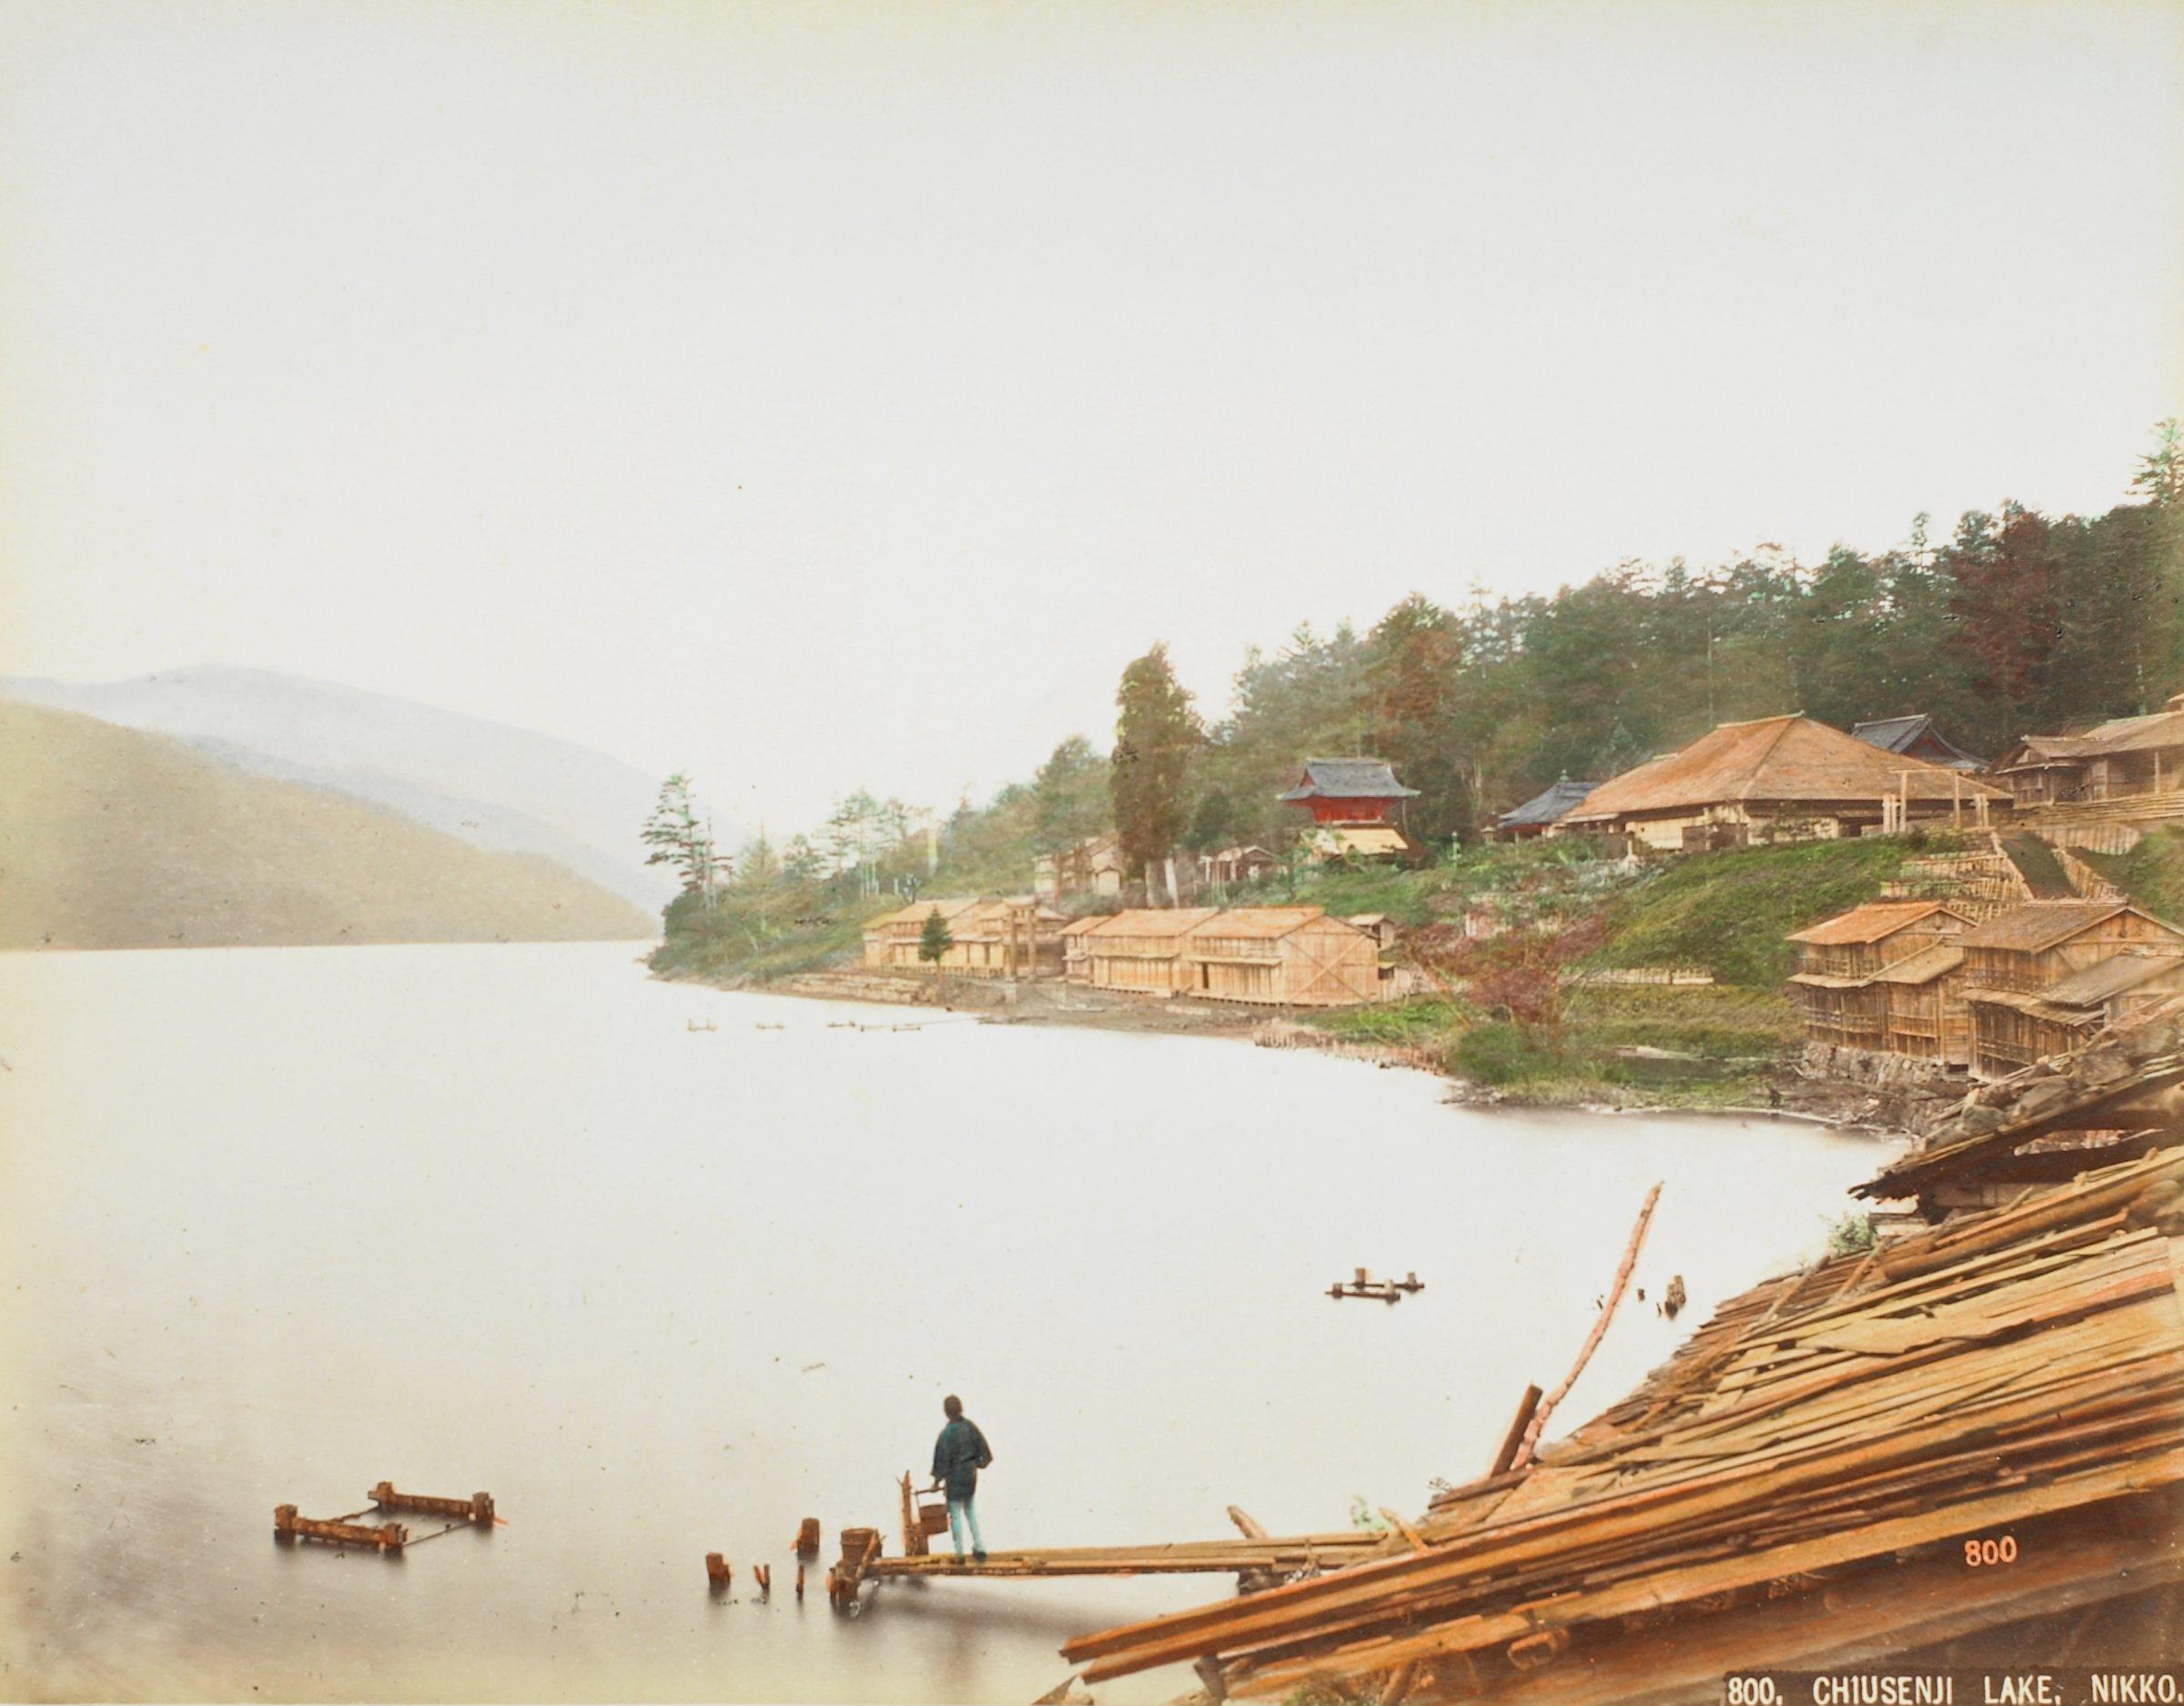 Chiusenji Lake, Nikko (.44, recto); Kakehashi Kisogawa (.45, verso), Attributed to Kusakabe Kimbei, hand-colored albumen prints mounted to album page